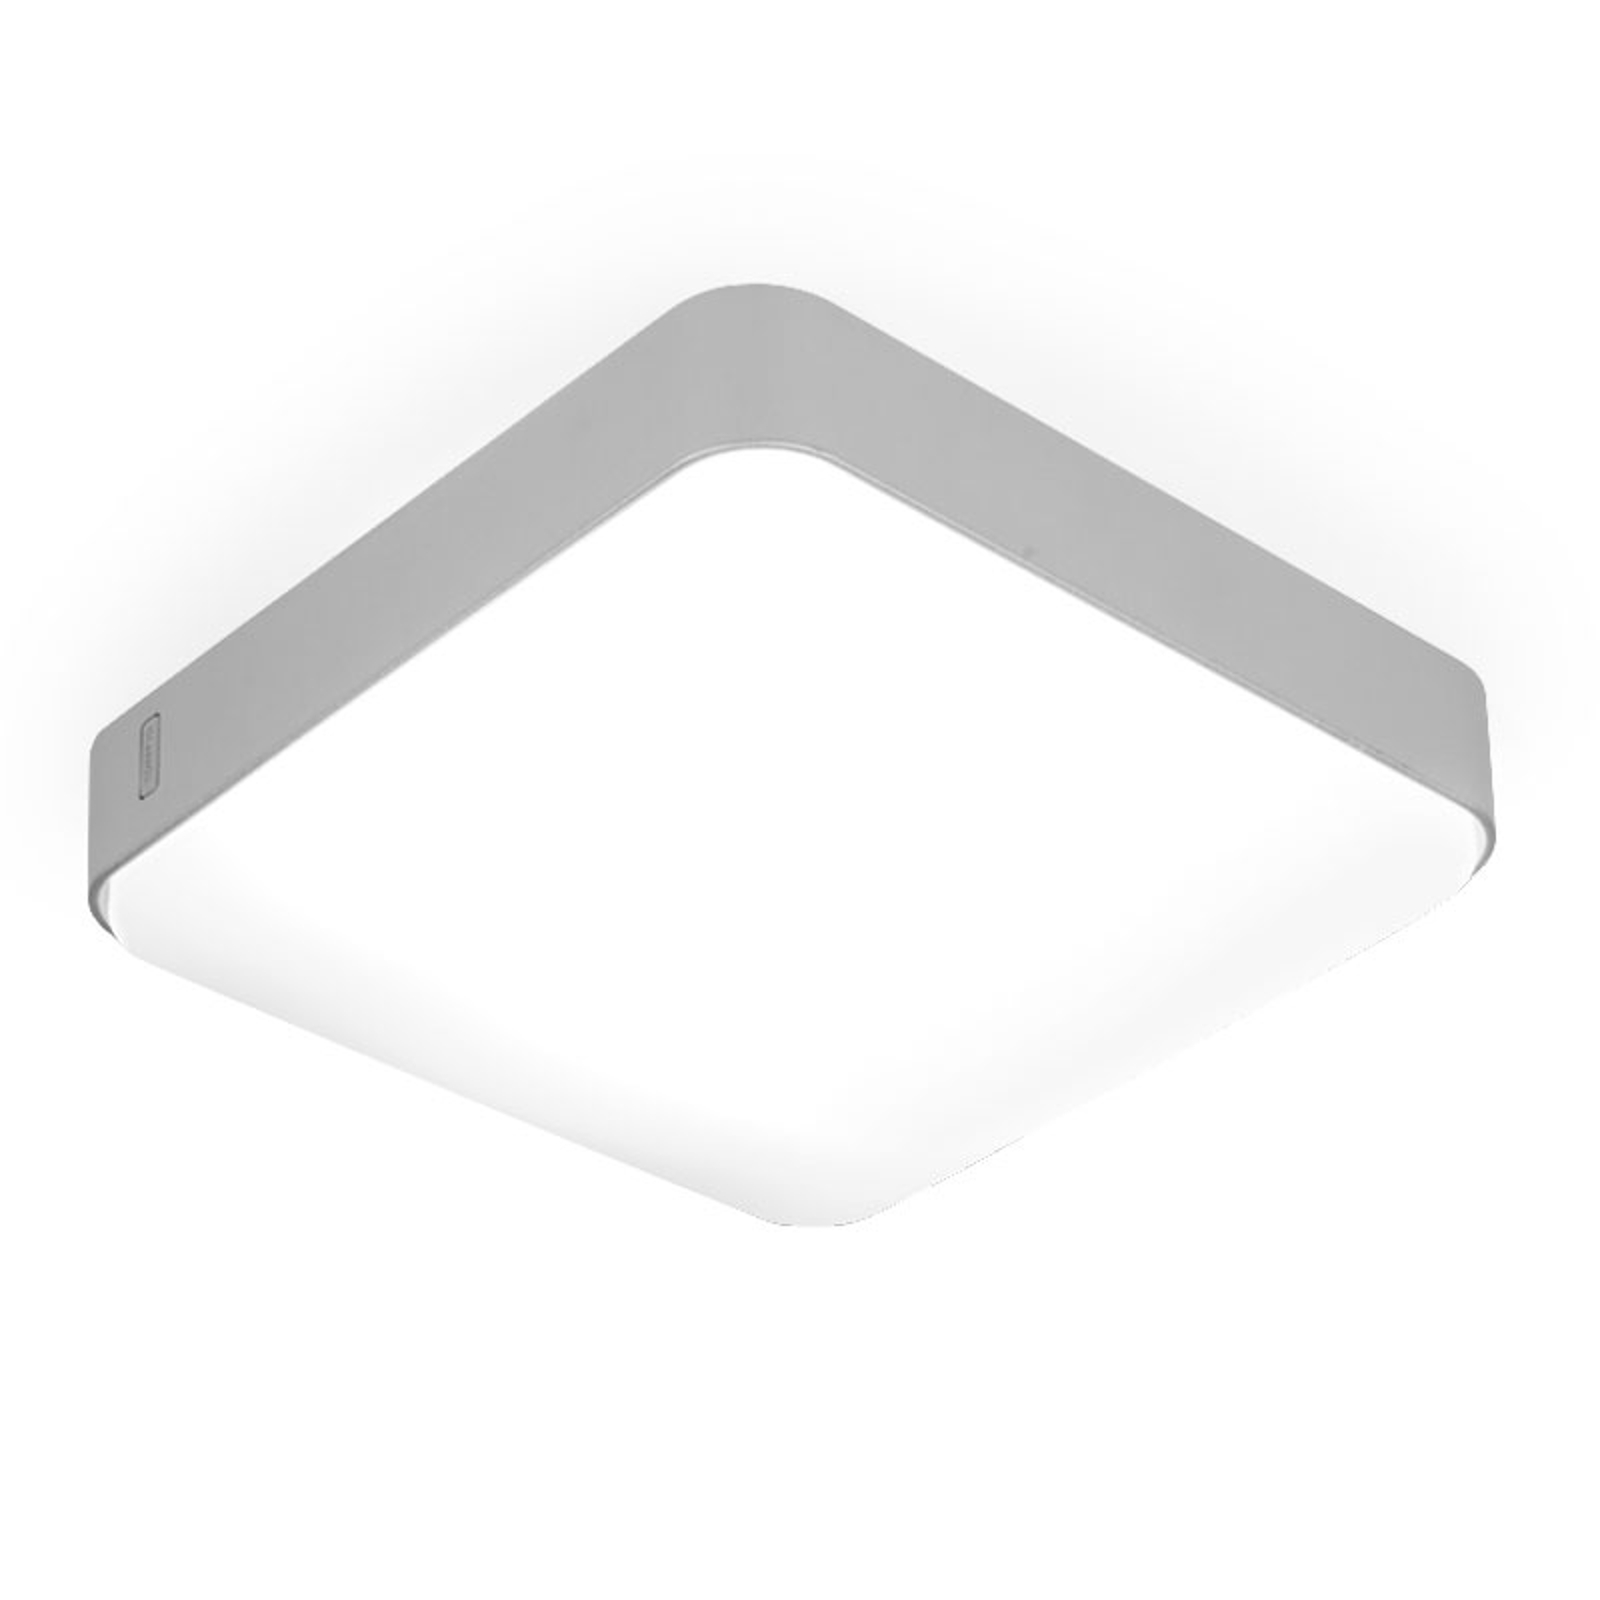 LED-Deckenleuchte A20-SQ, 40x40 cm, 3.000 K